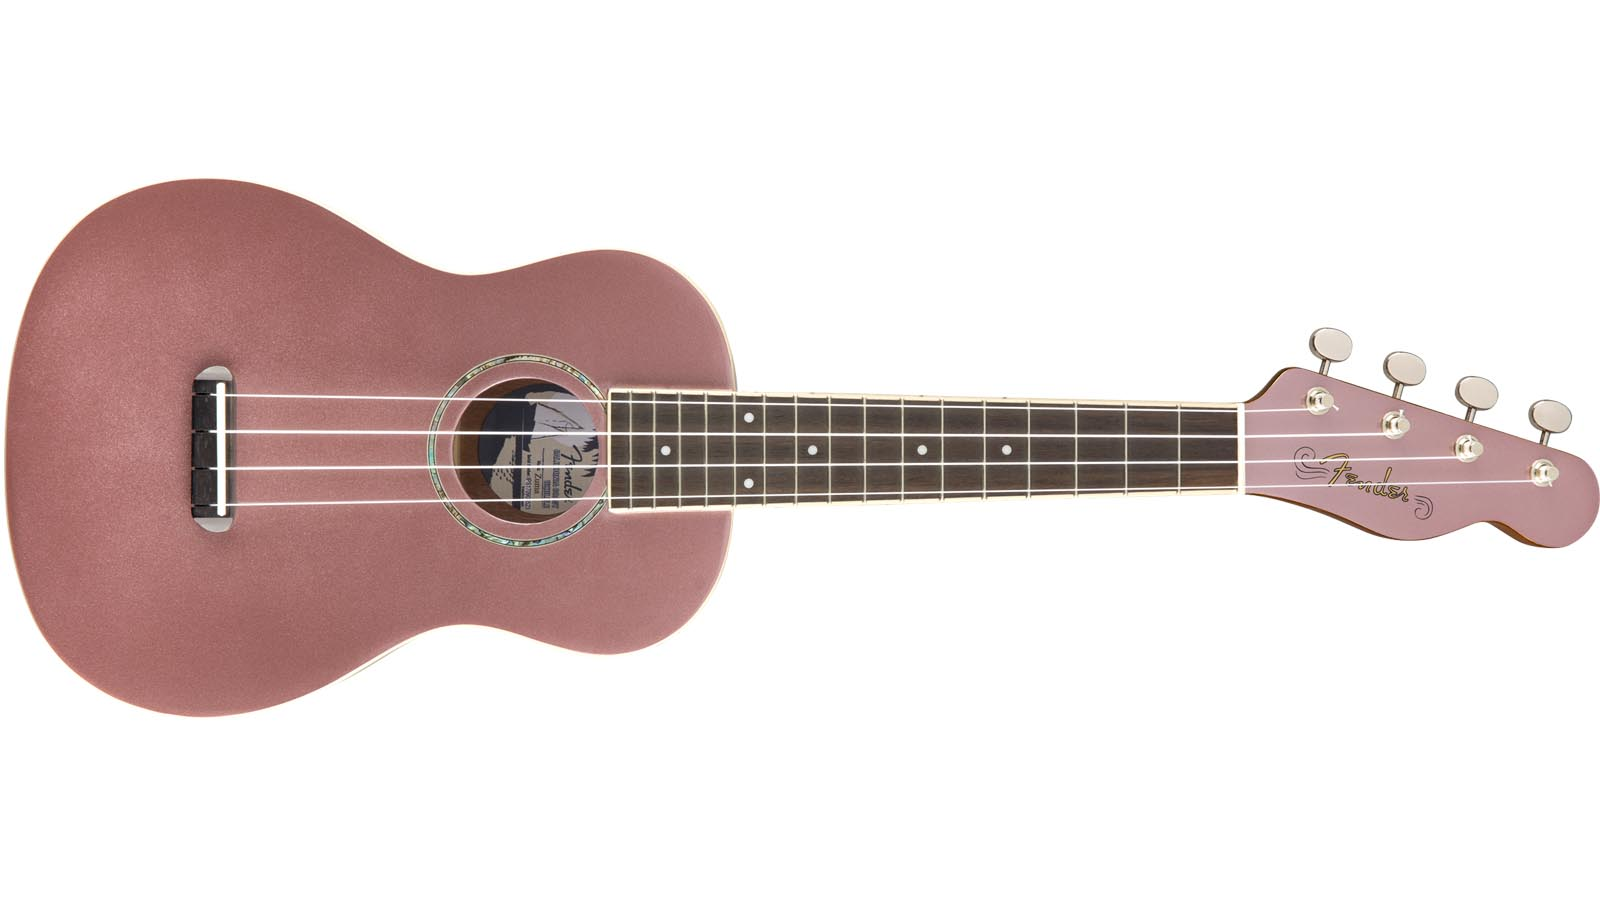 Fender Zuma Concert Ukulele BGM Burgundy Mist